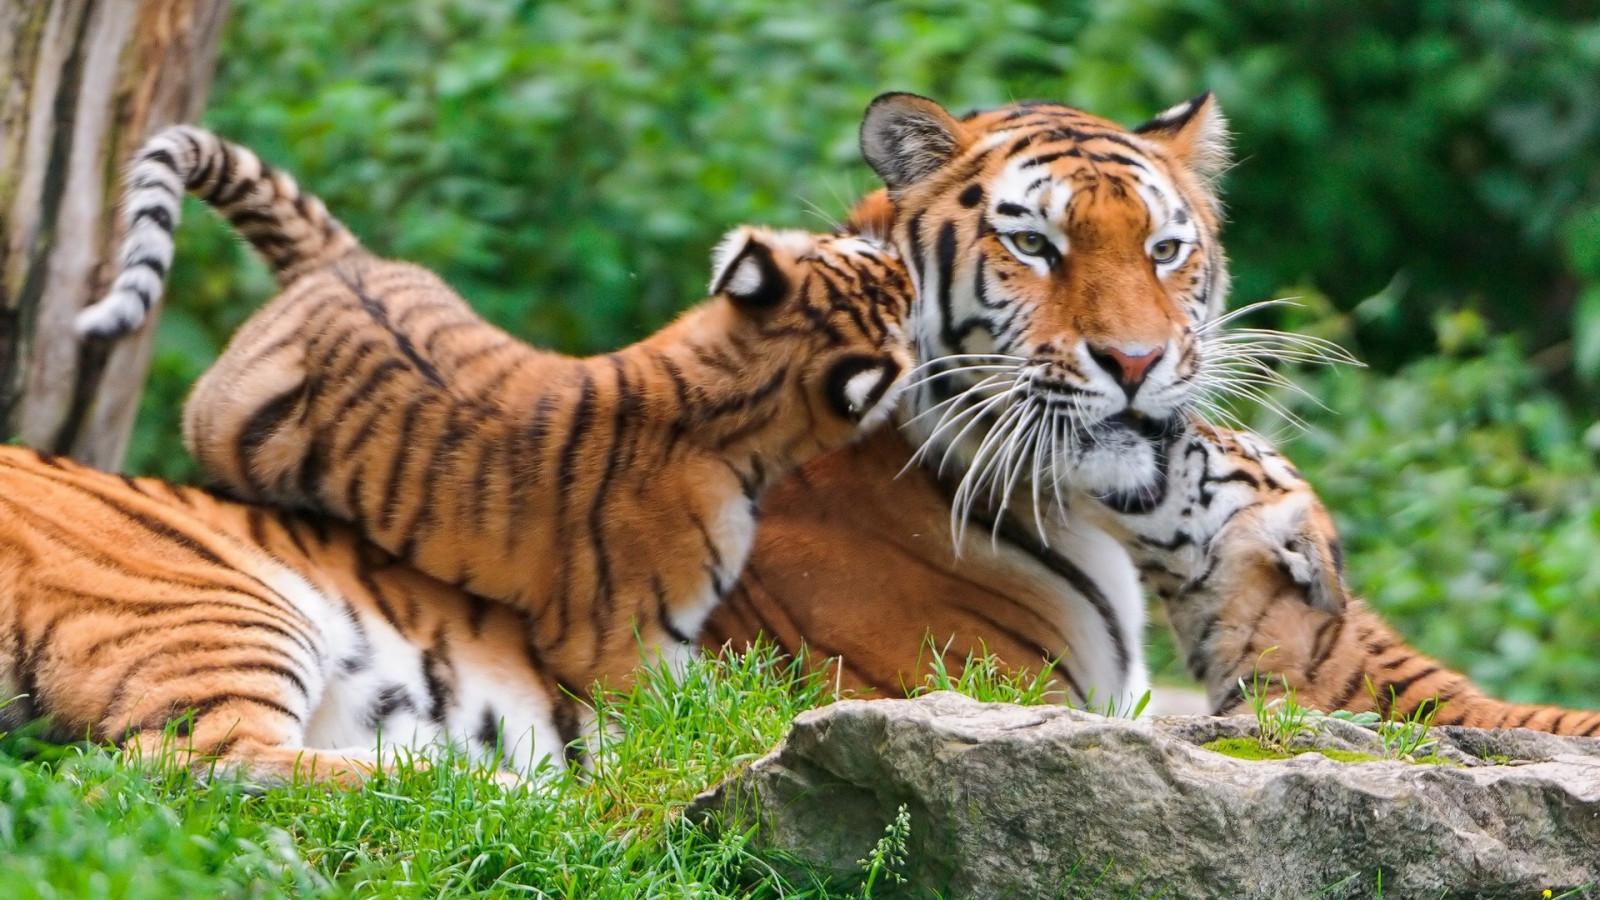 Hd Animal Wallpapers Pets Zoo Animal Love Animal: Sfondi : Animali, Natura, Tigre, Grandi Gatti, Zoo